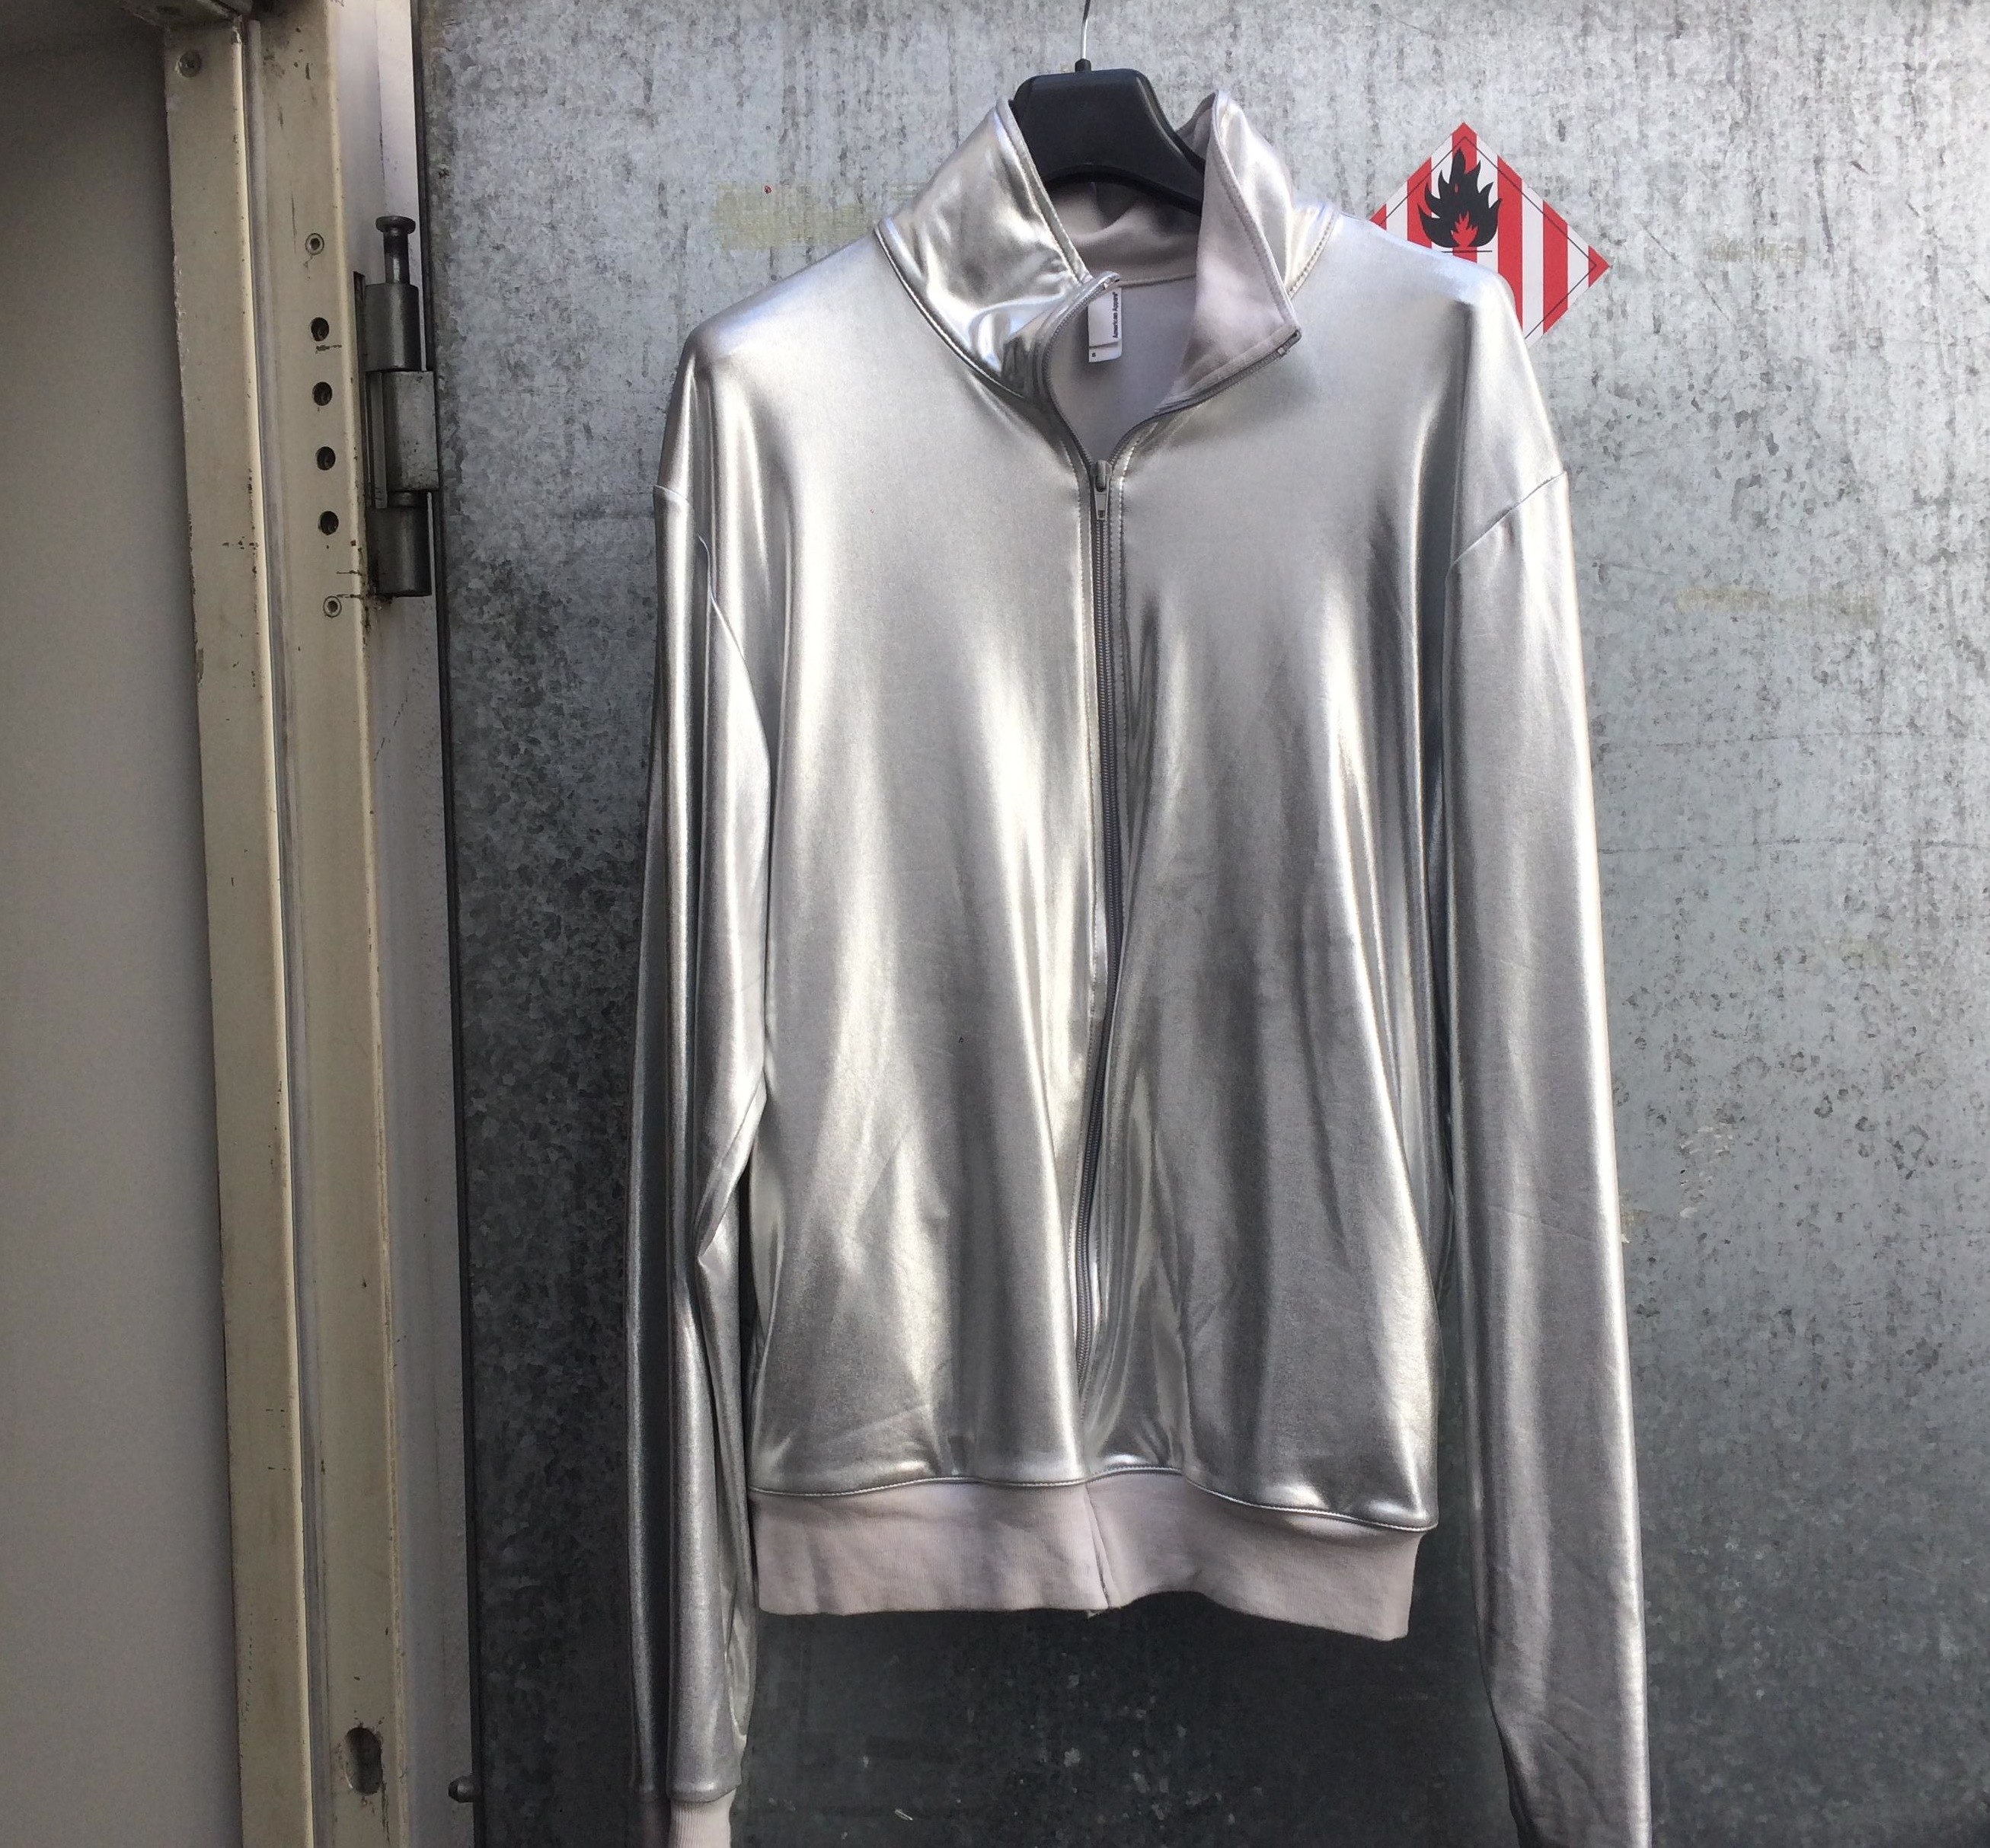 janosch moldau stage apparel silver sparkle